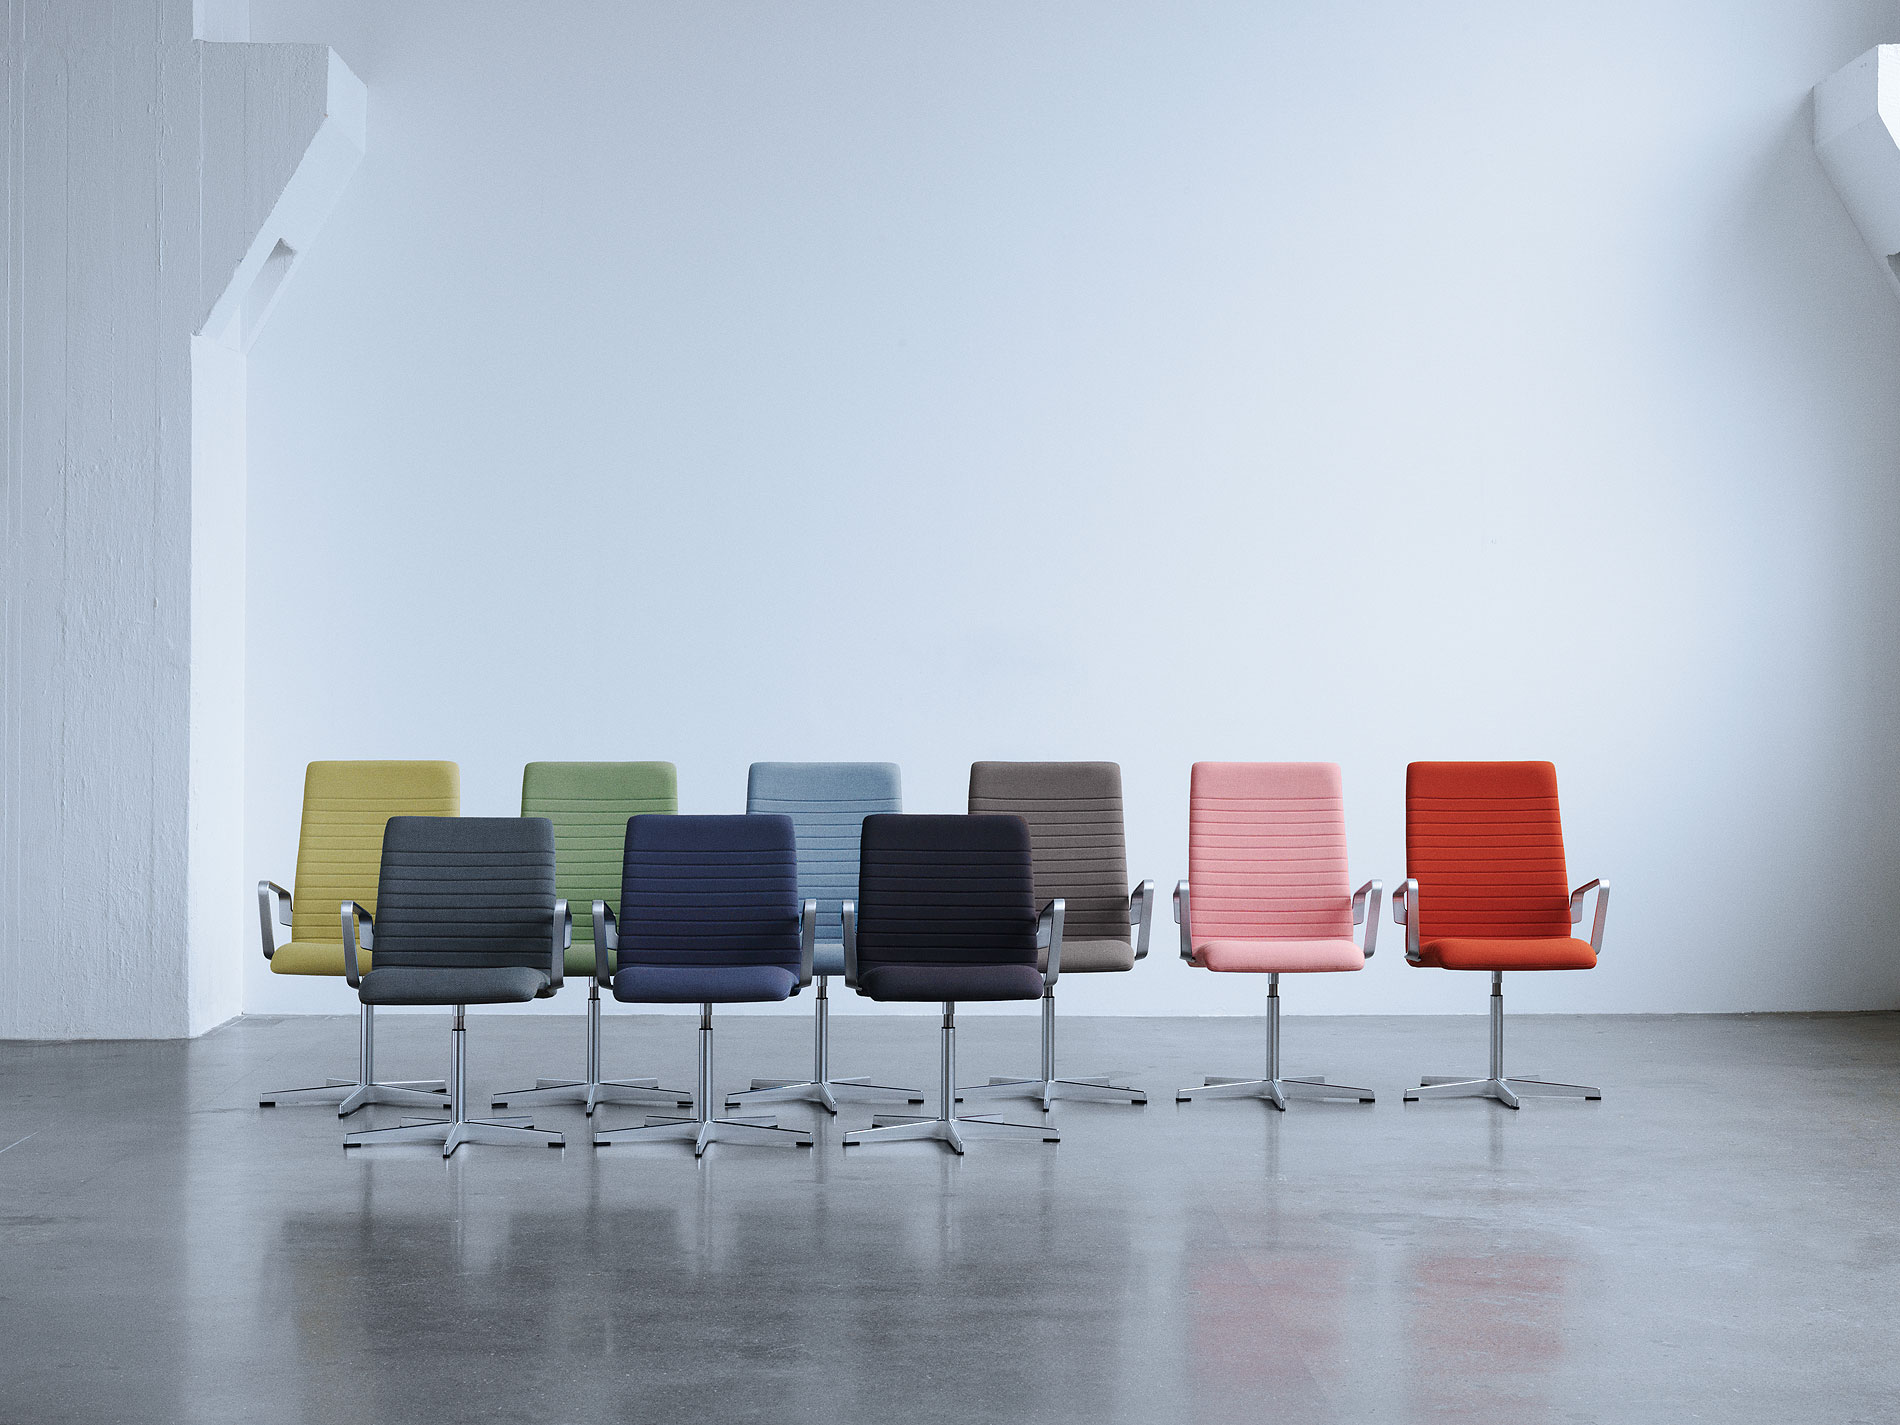 fritz hansen moderniza la silla oxford de arne jacobsen. Black Bedroom Furniture Sets. Home Design Ideas